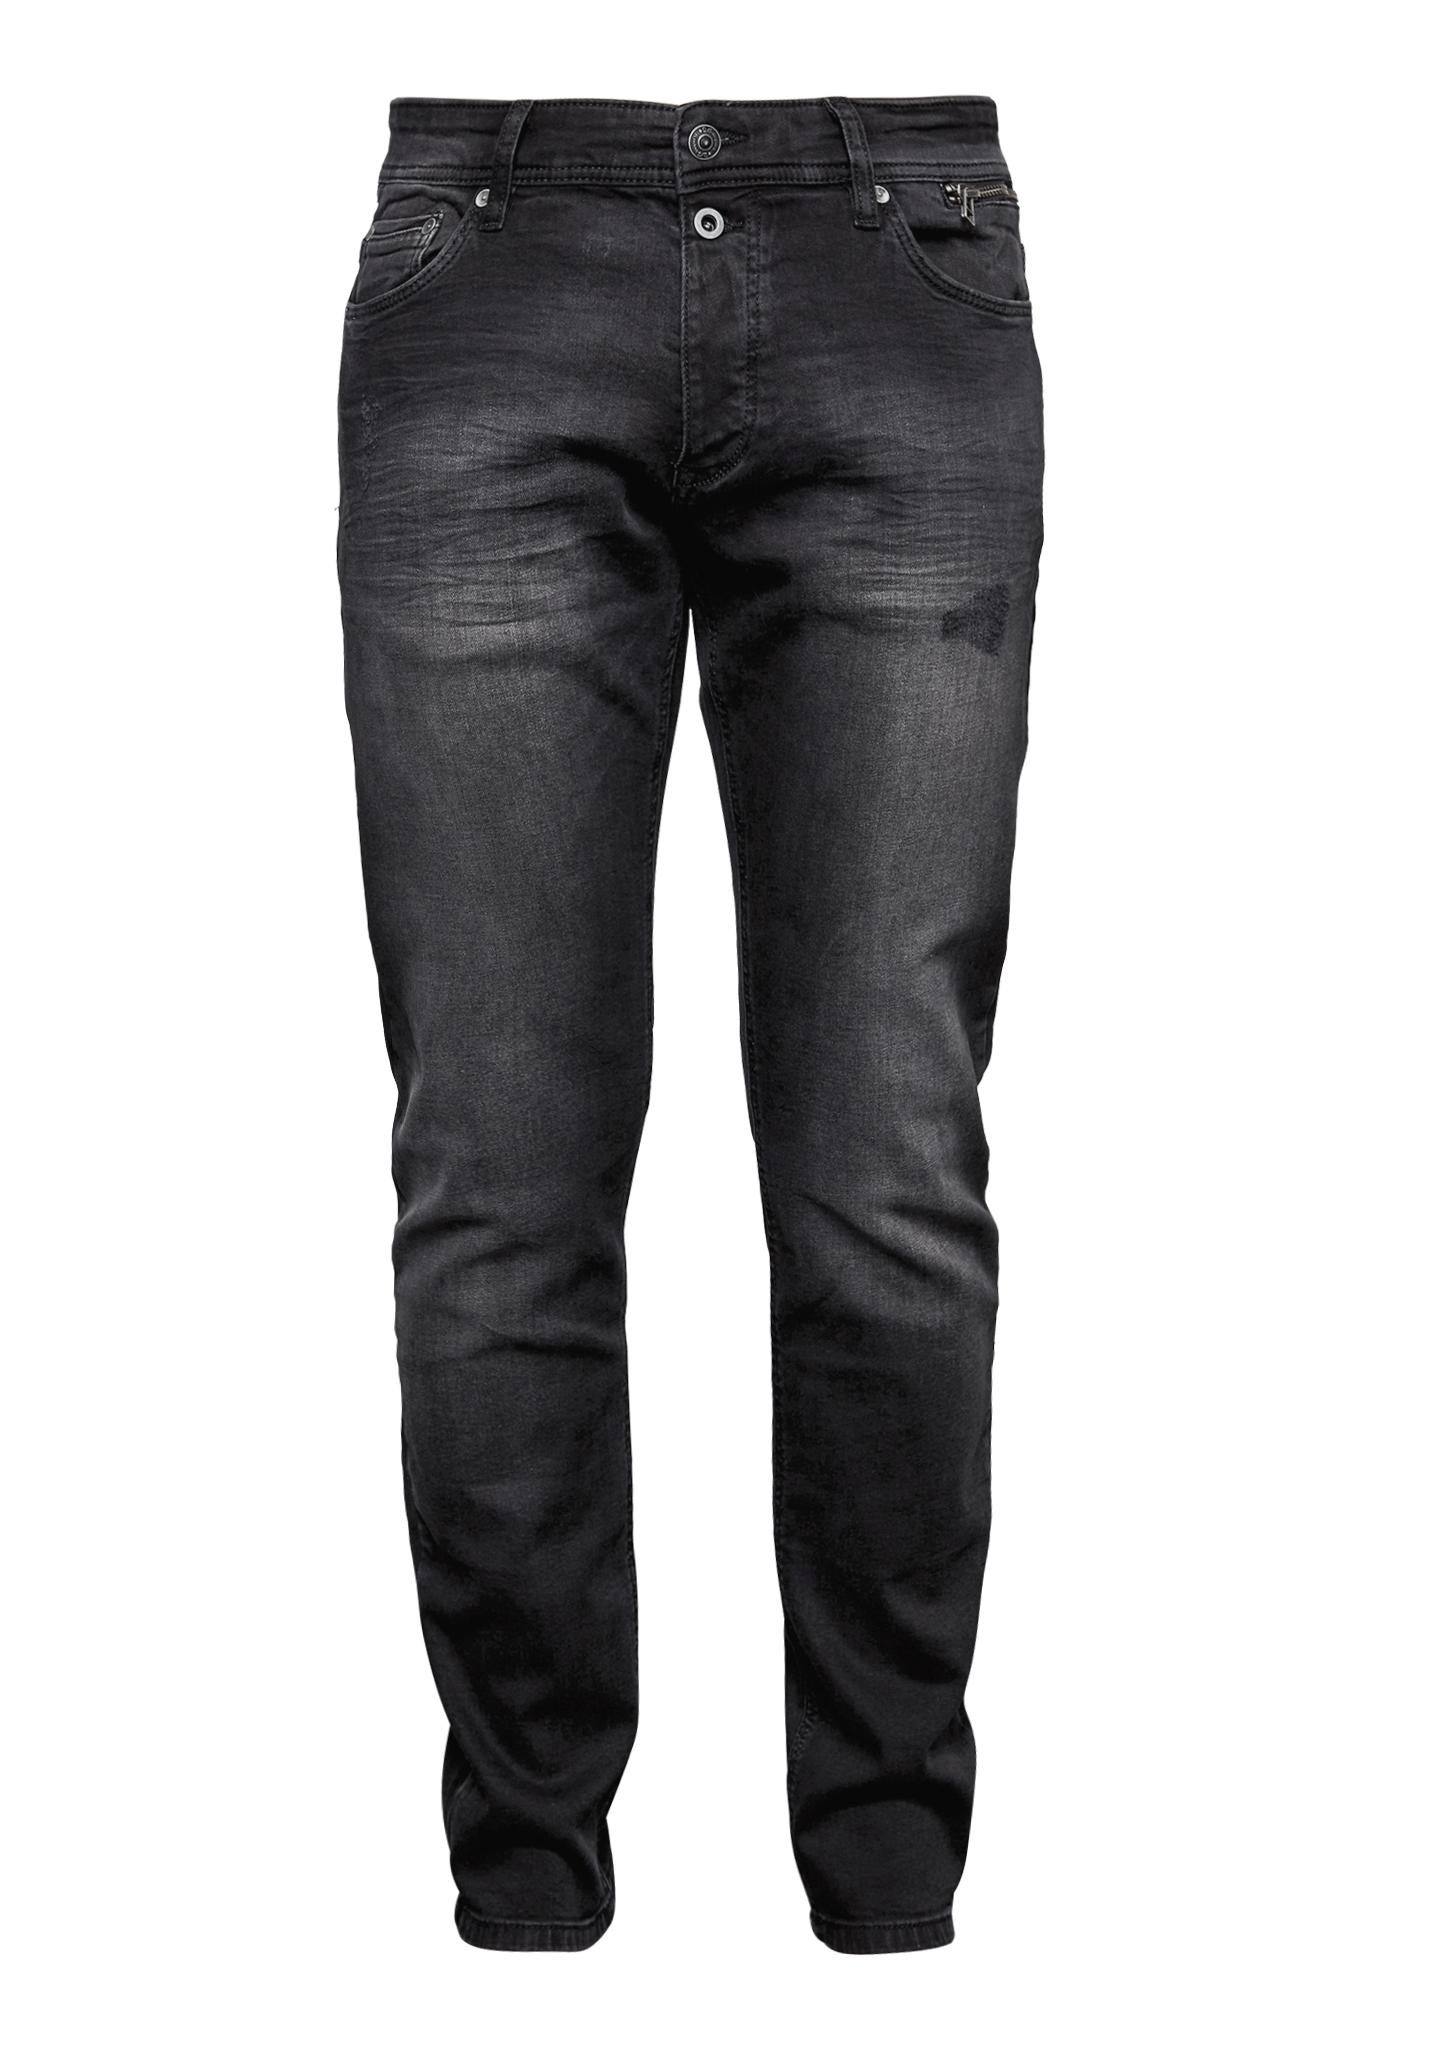 Hose | Bekleidung > Hosen | Grau/schwarz | 99% baumwolle -  1% elasthan | Q/S designed by